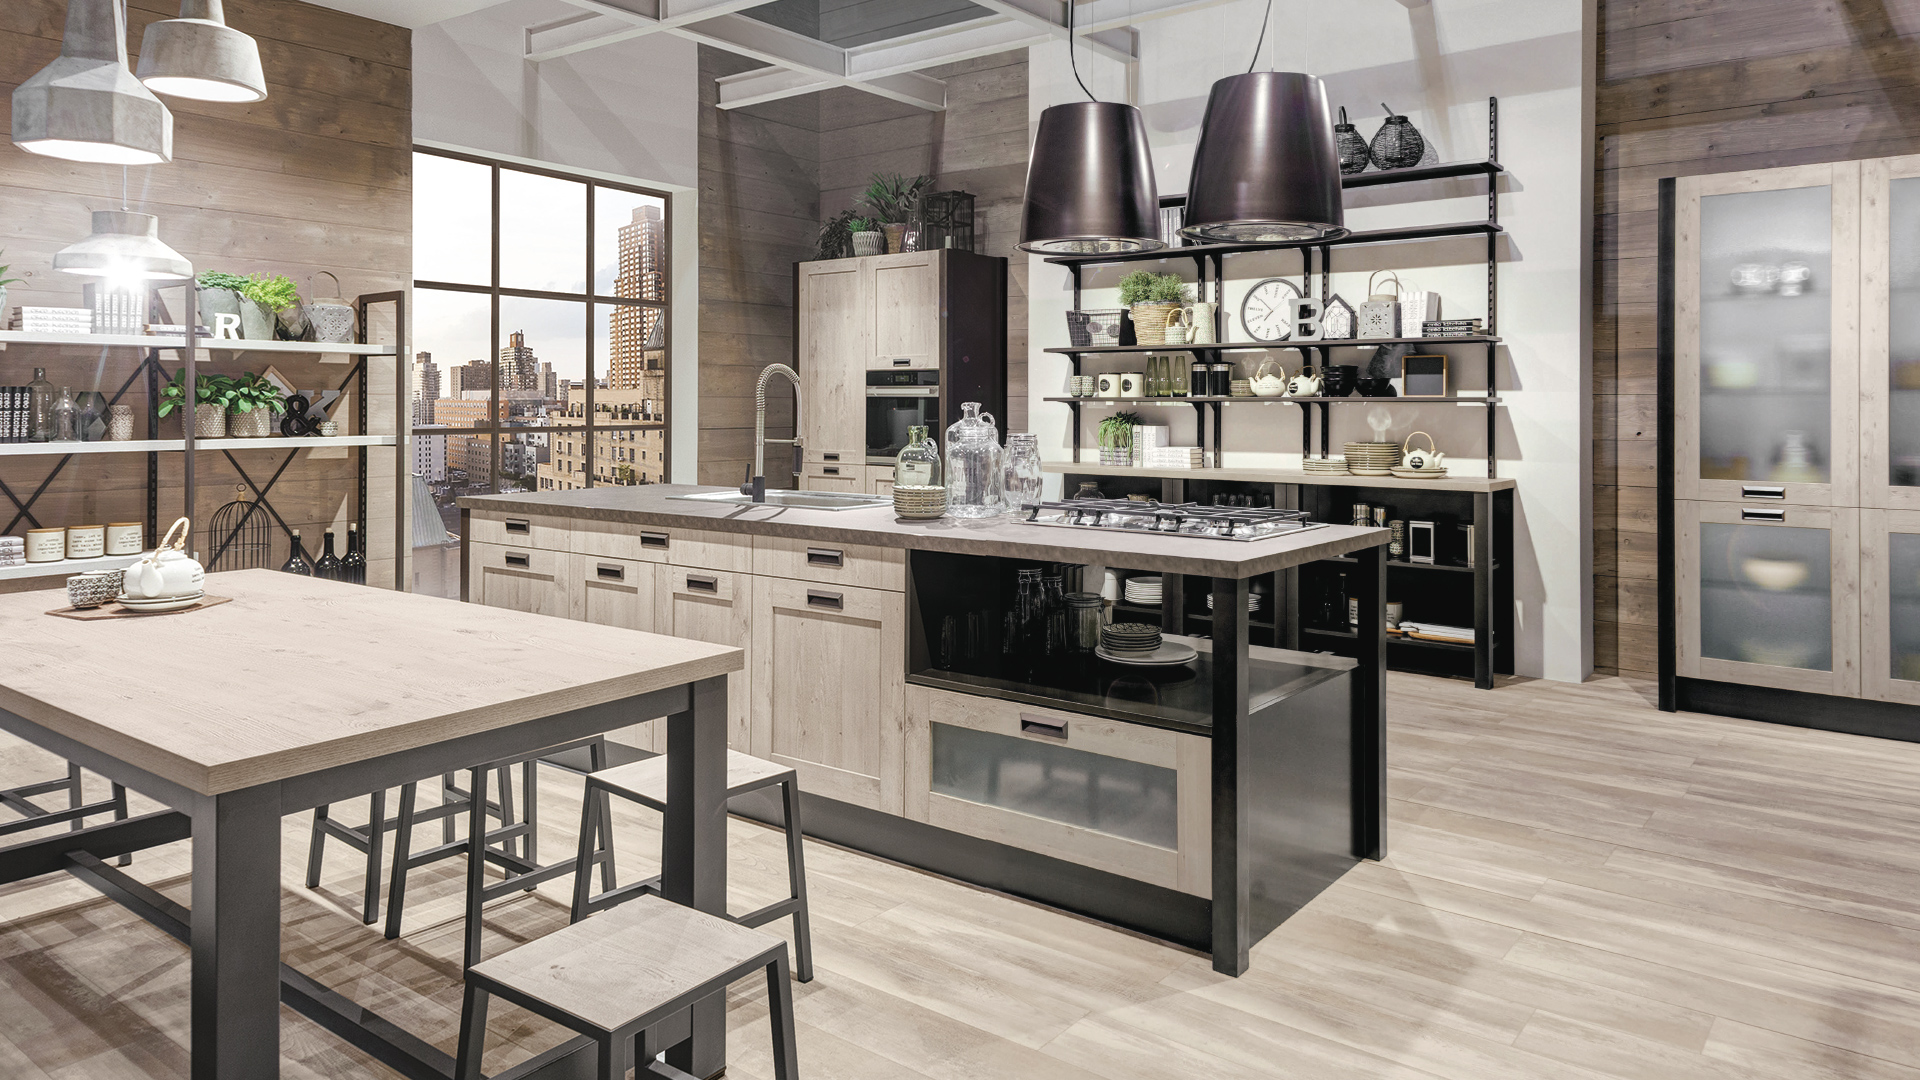 Cucina Kyra Creo Prezzo kyra frame - modern kitchens - creo kitchens